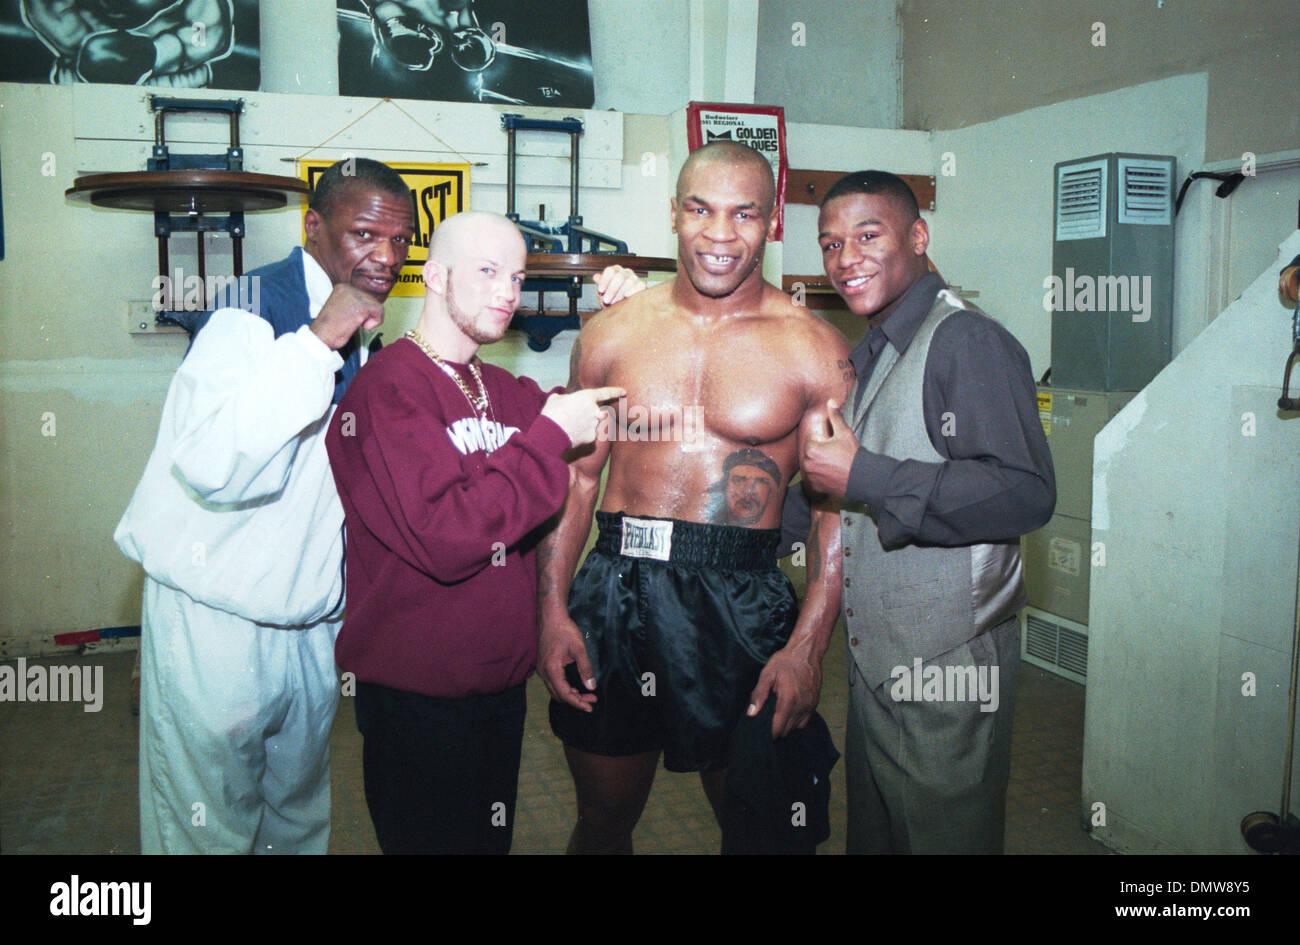 ¿Cuánto mide Mike Tyson? - Altura - Real height Jan-28-2002-las-vegas-nv-usa-file-photo-1999-!-ltor-trainer-floyd-DMW8Y5